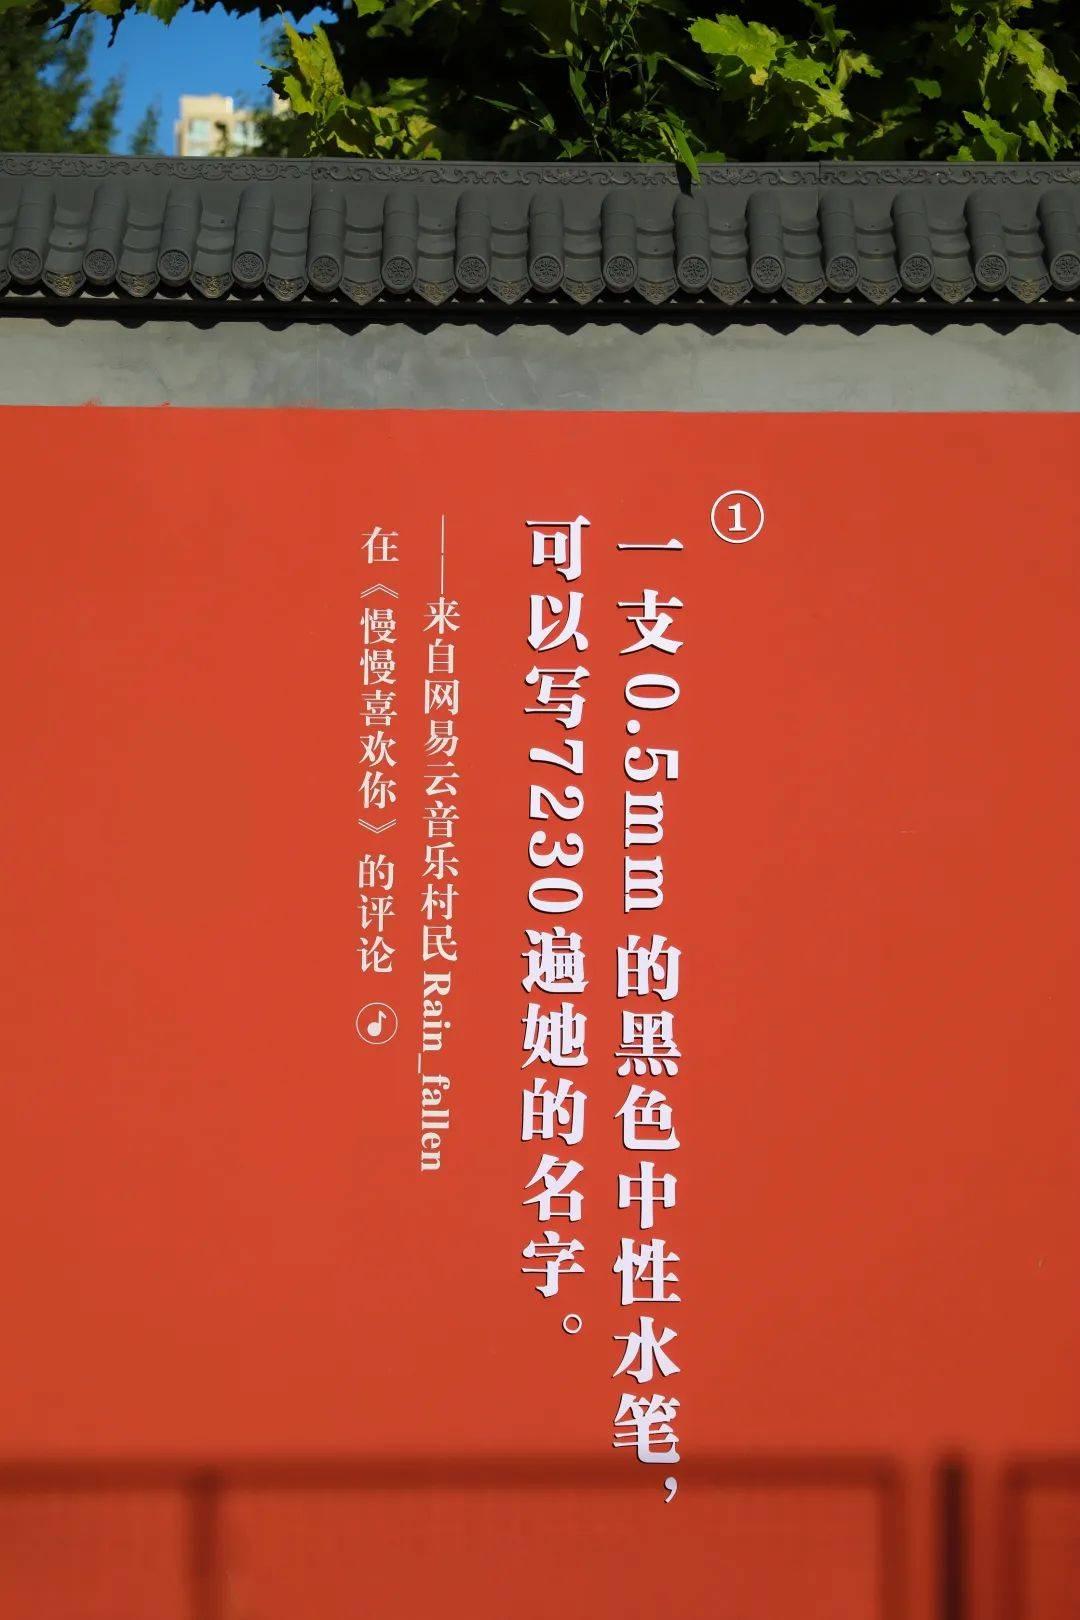 12177512186141aa9cd3fd40.04337380 - 网易云音乐,一本情感营销的教科书